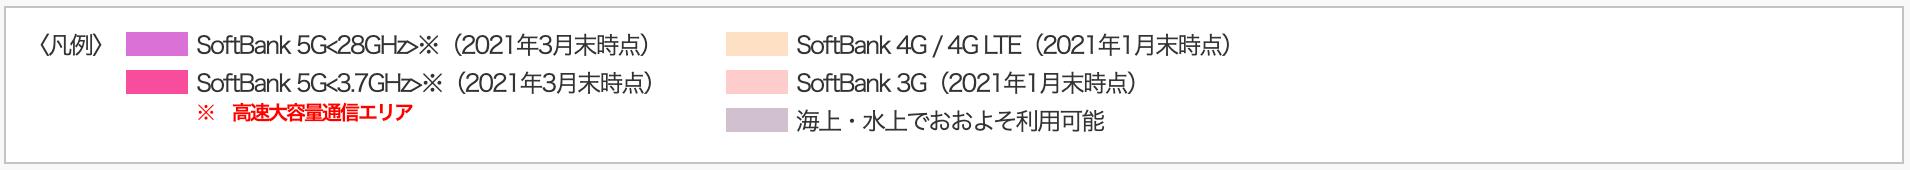 SoftBank5Gエリアの詳細情報